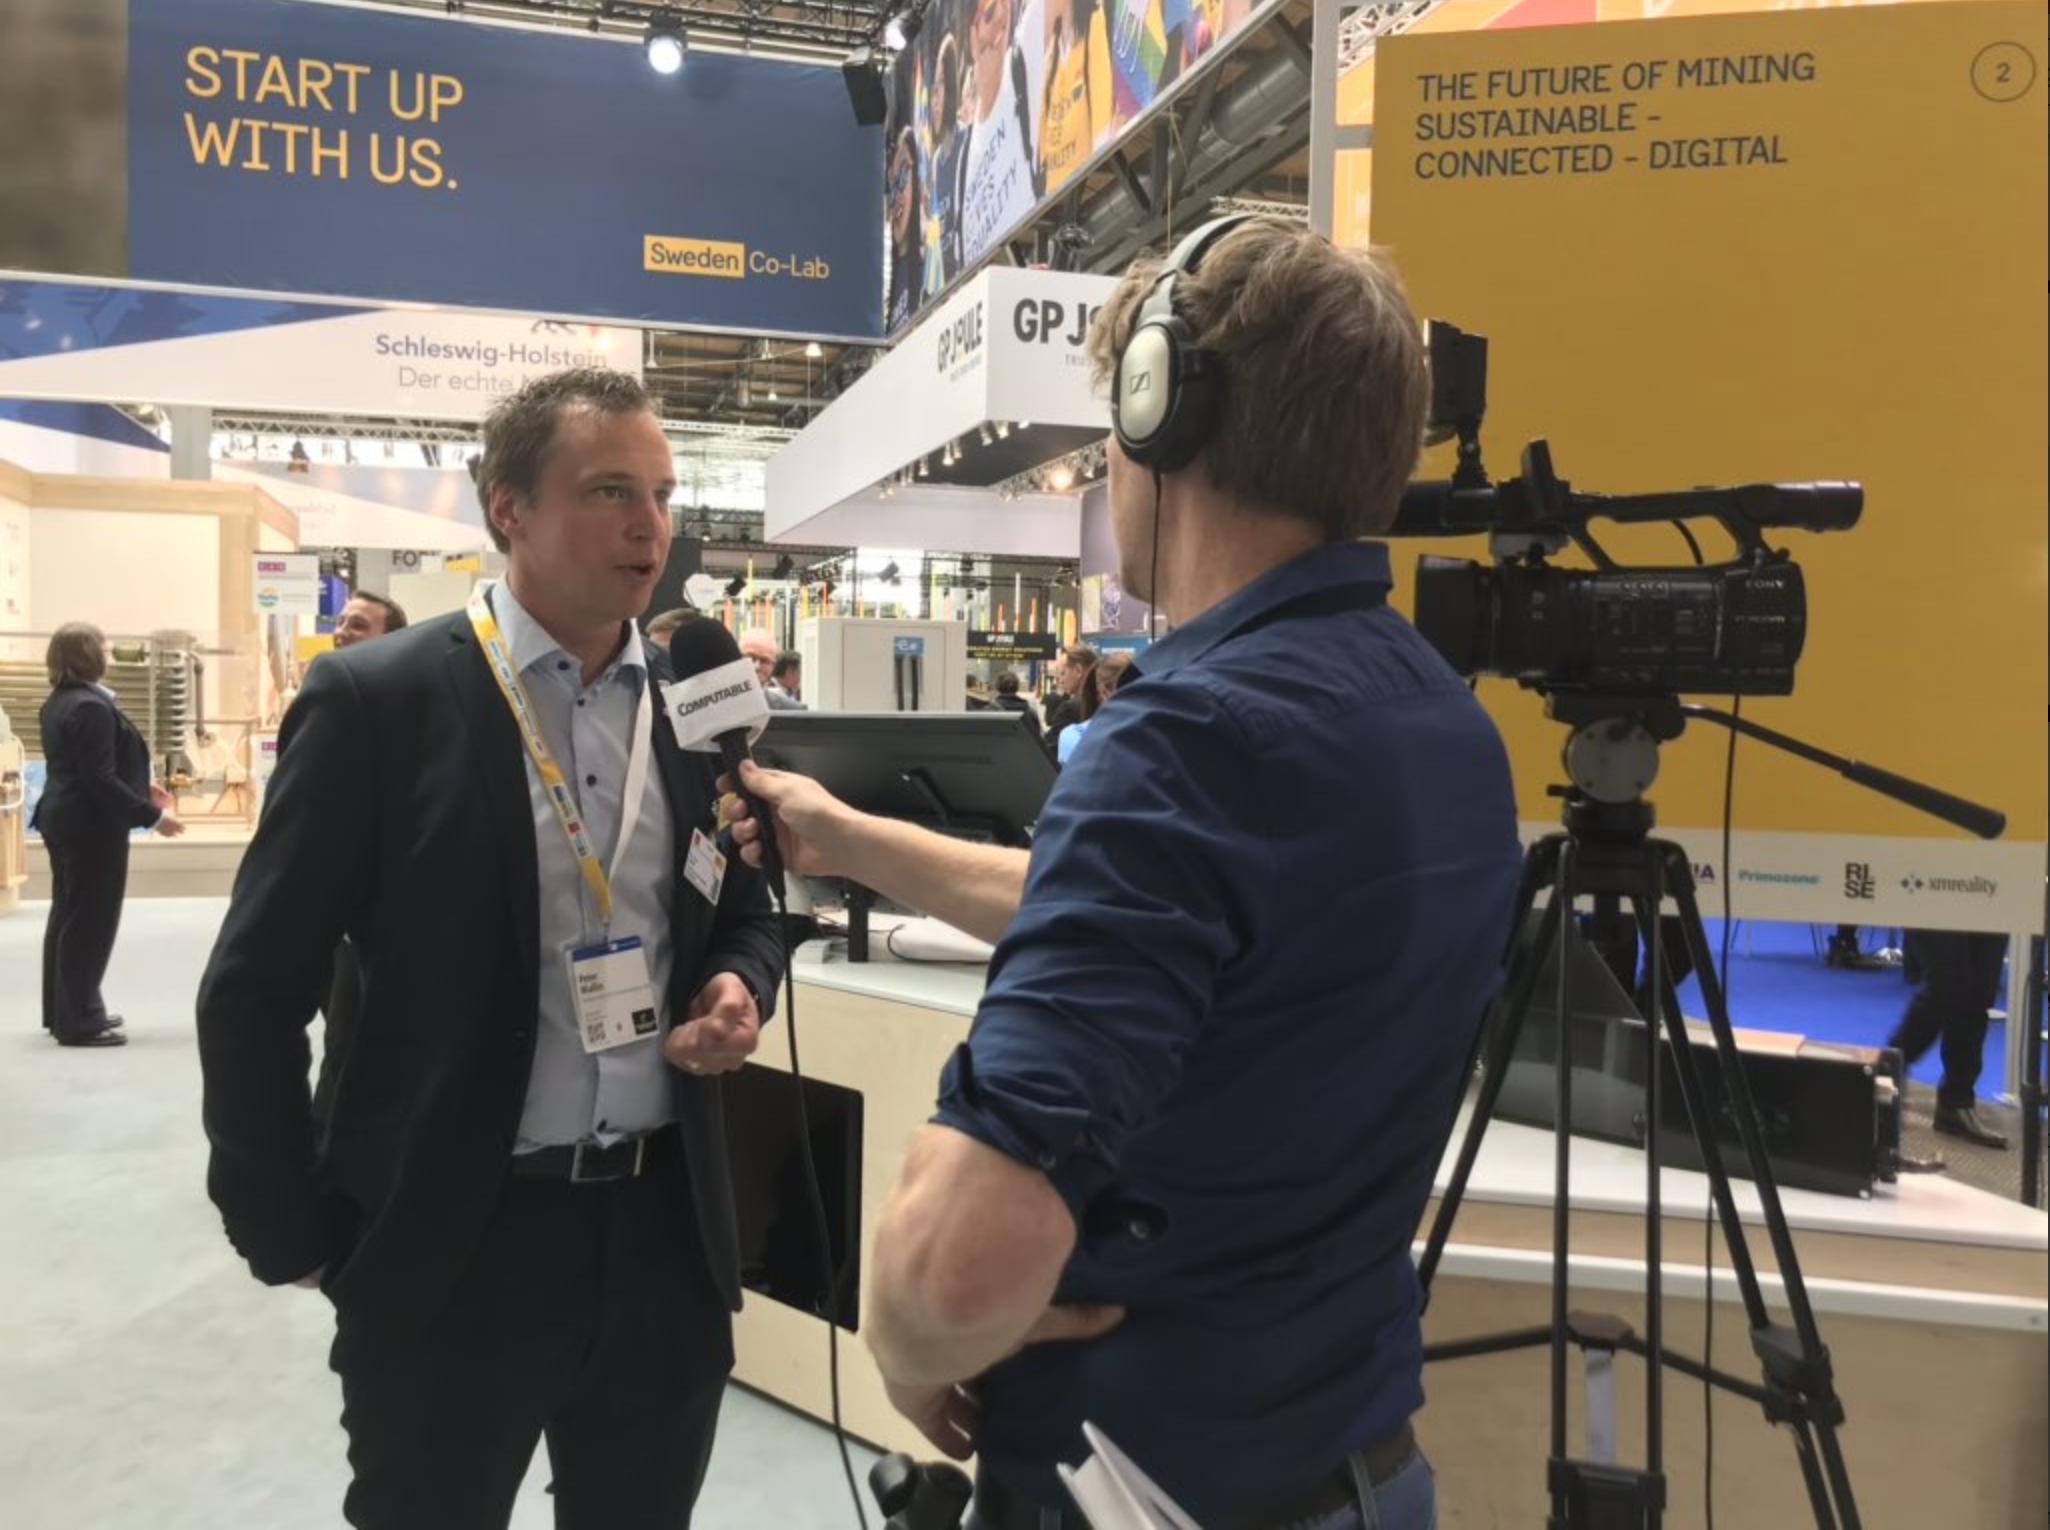 Peter Wallin blir intervjuad i Hannover